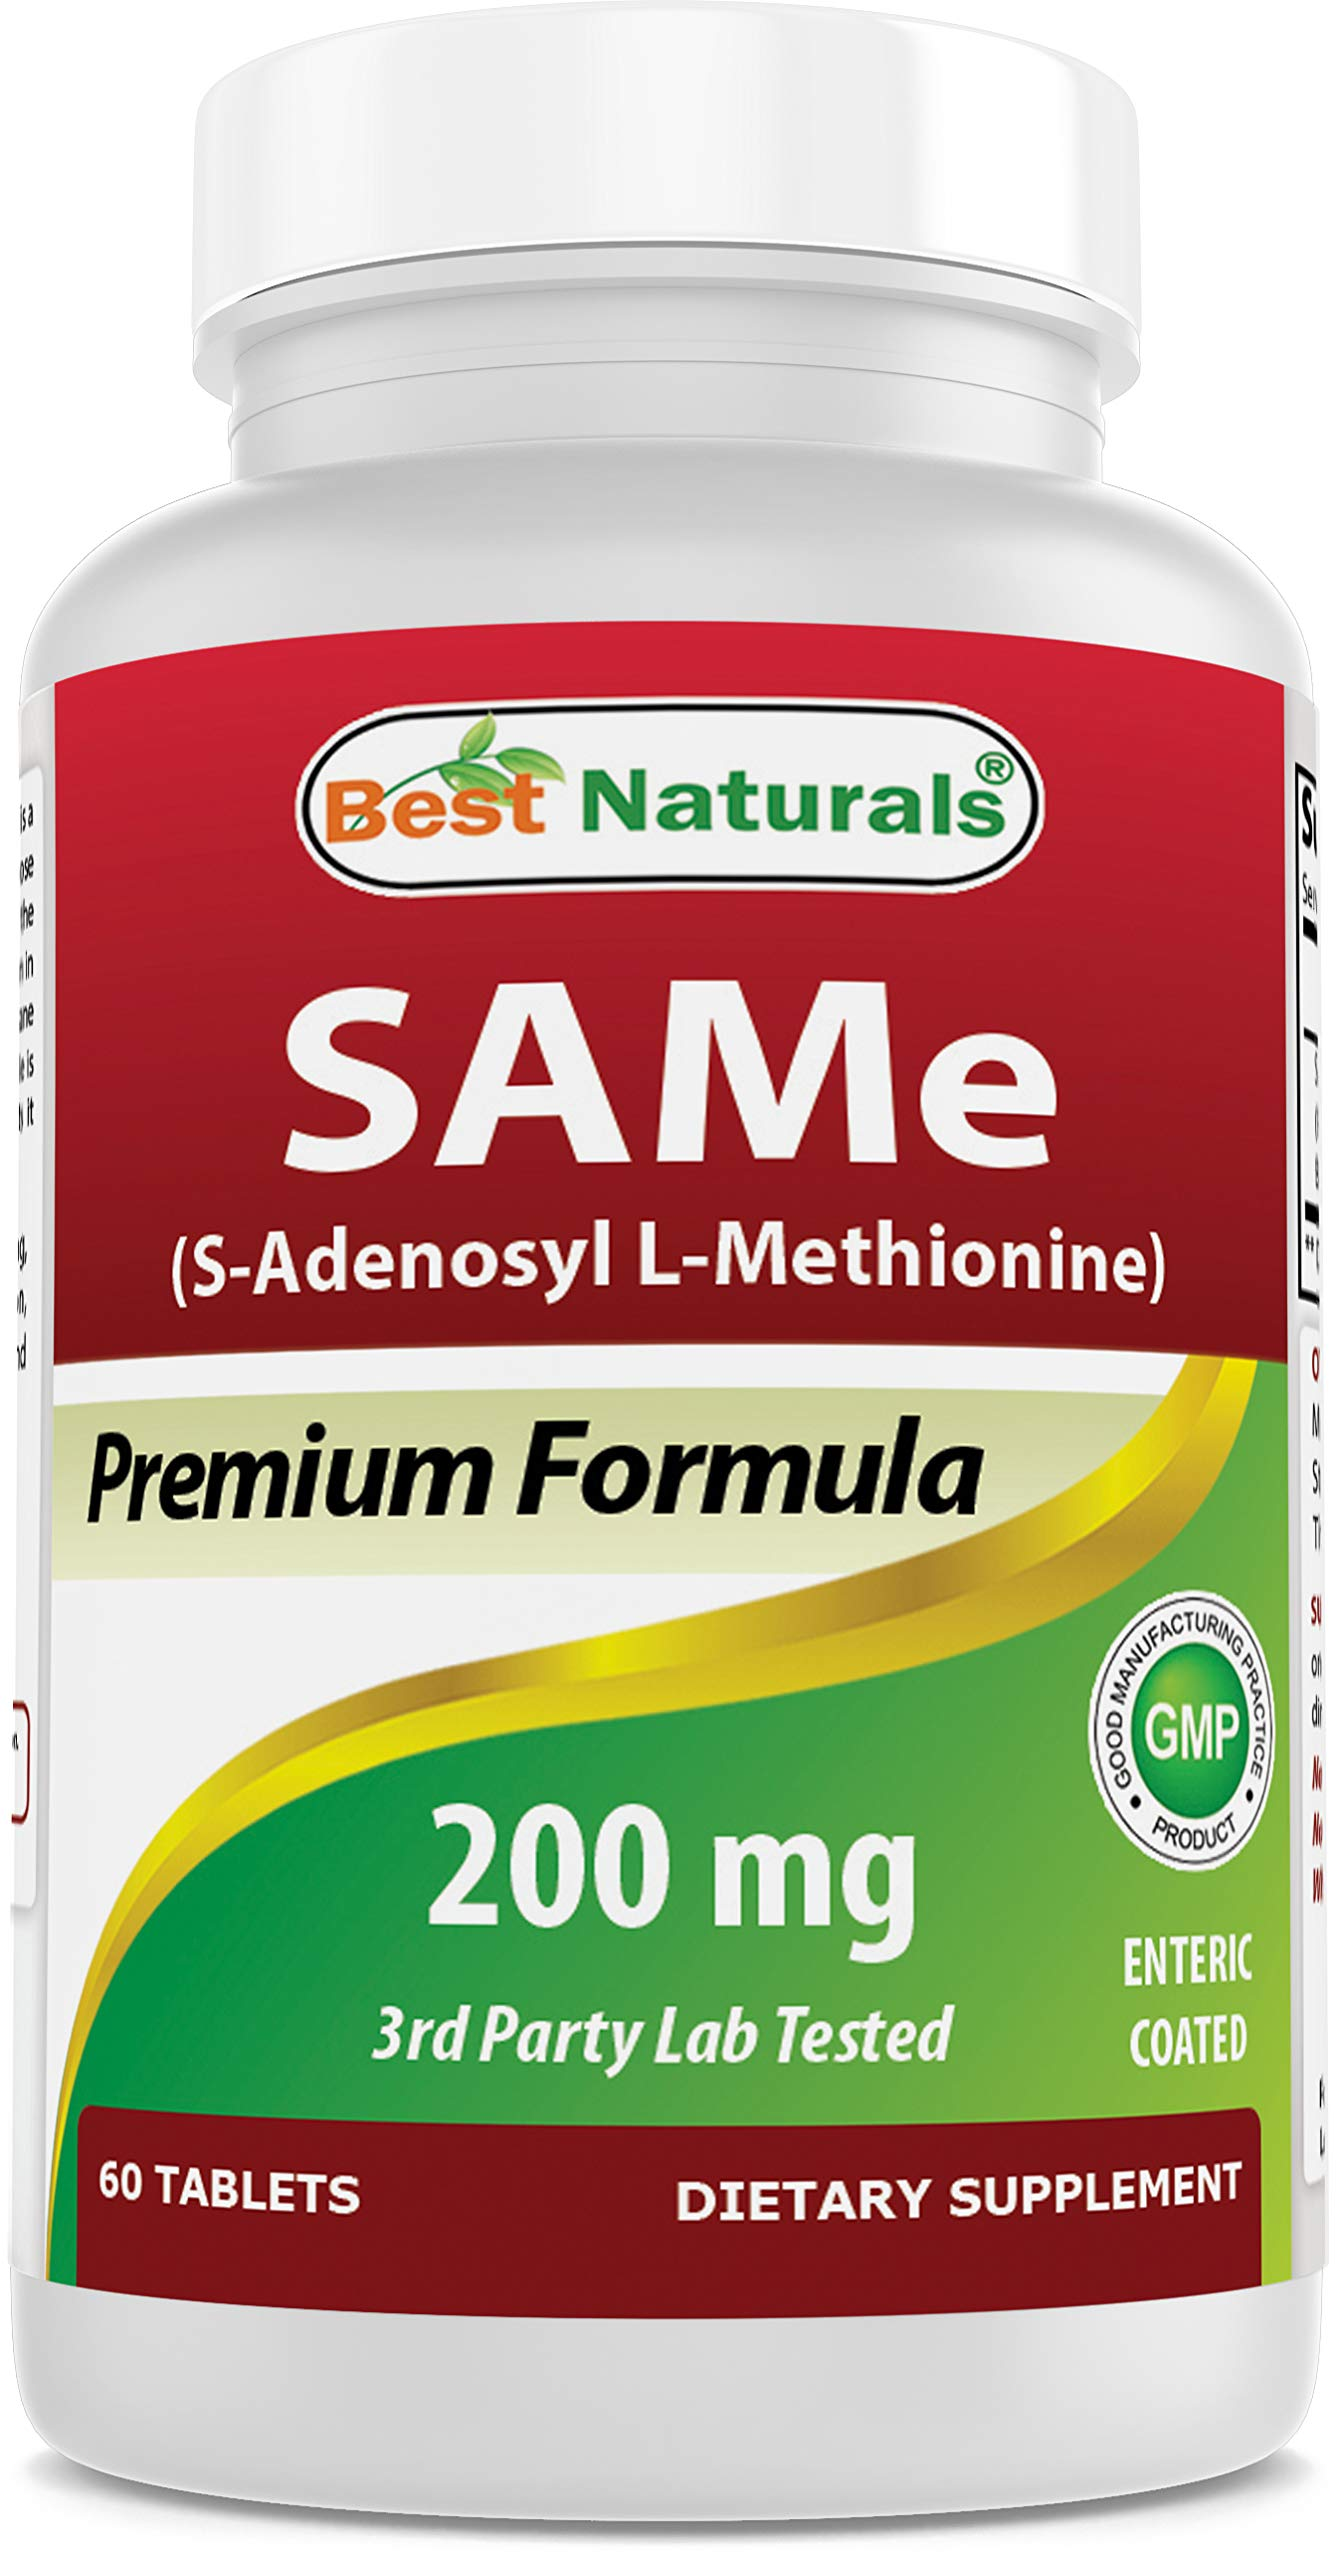 Best Naturals Sam-e Enteric Coated 200 mg 60 Tablets